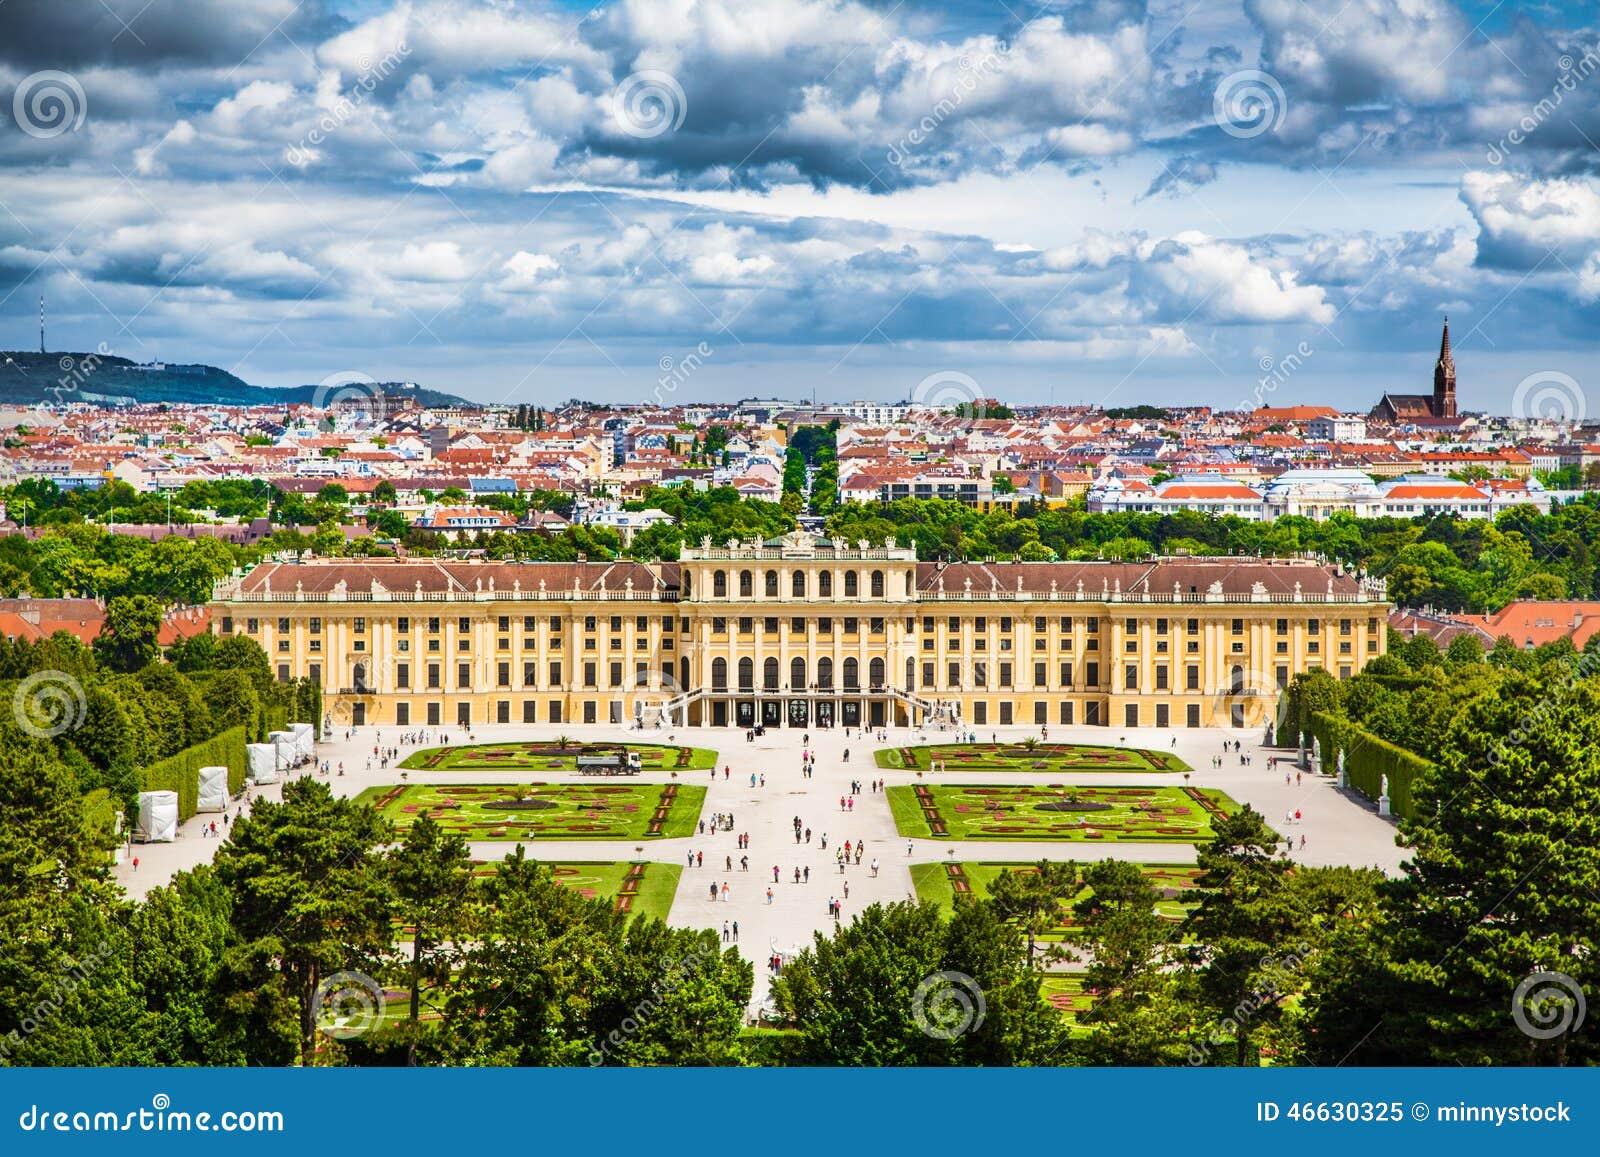 Berühmter Schonbrunn-Palast in Wien, Österreich